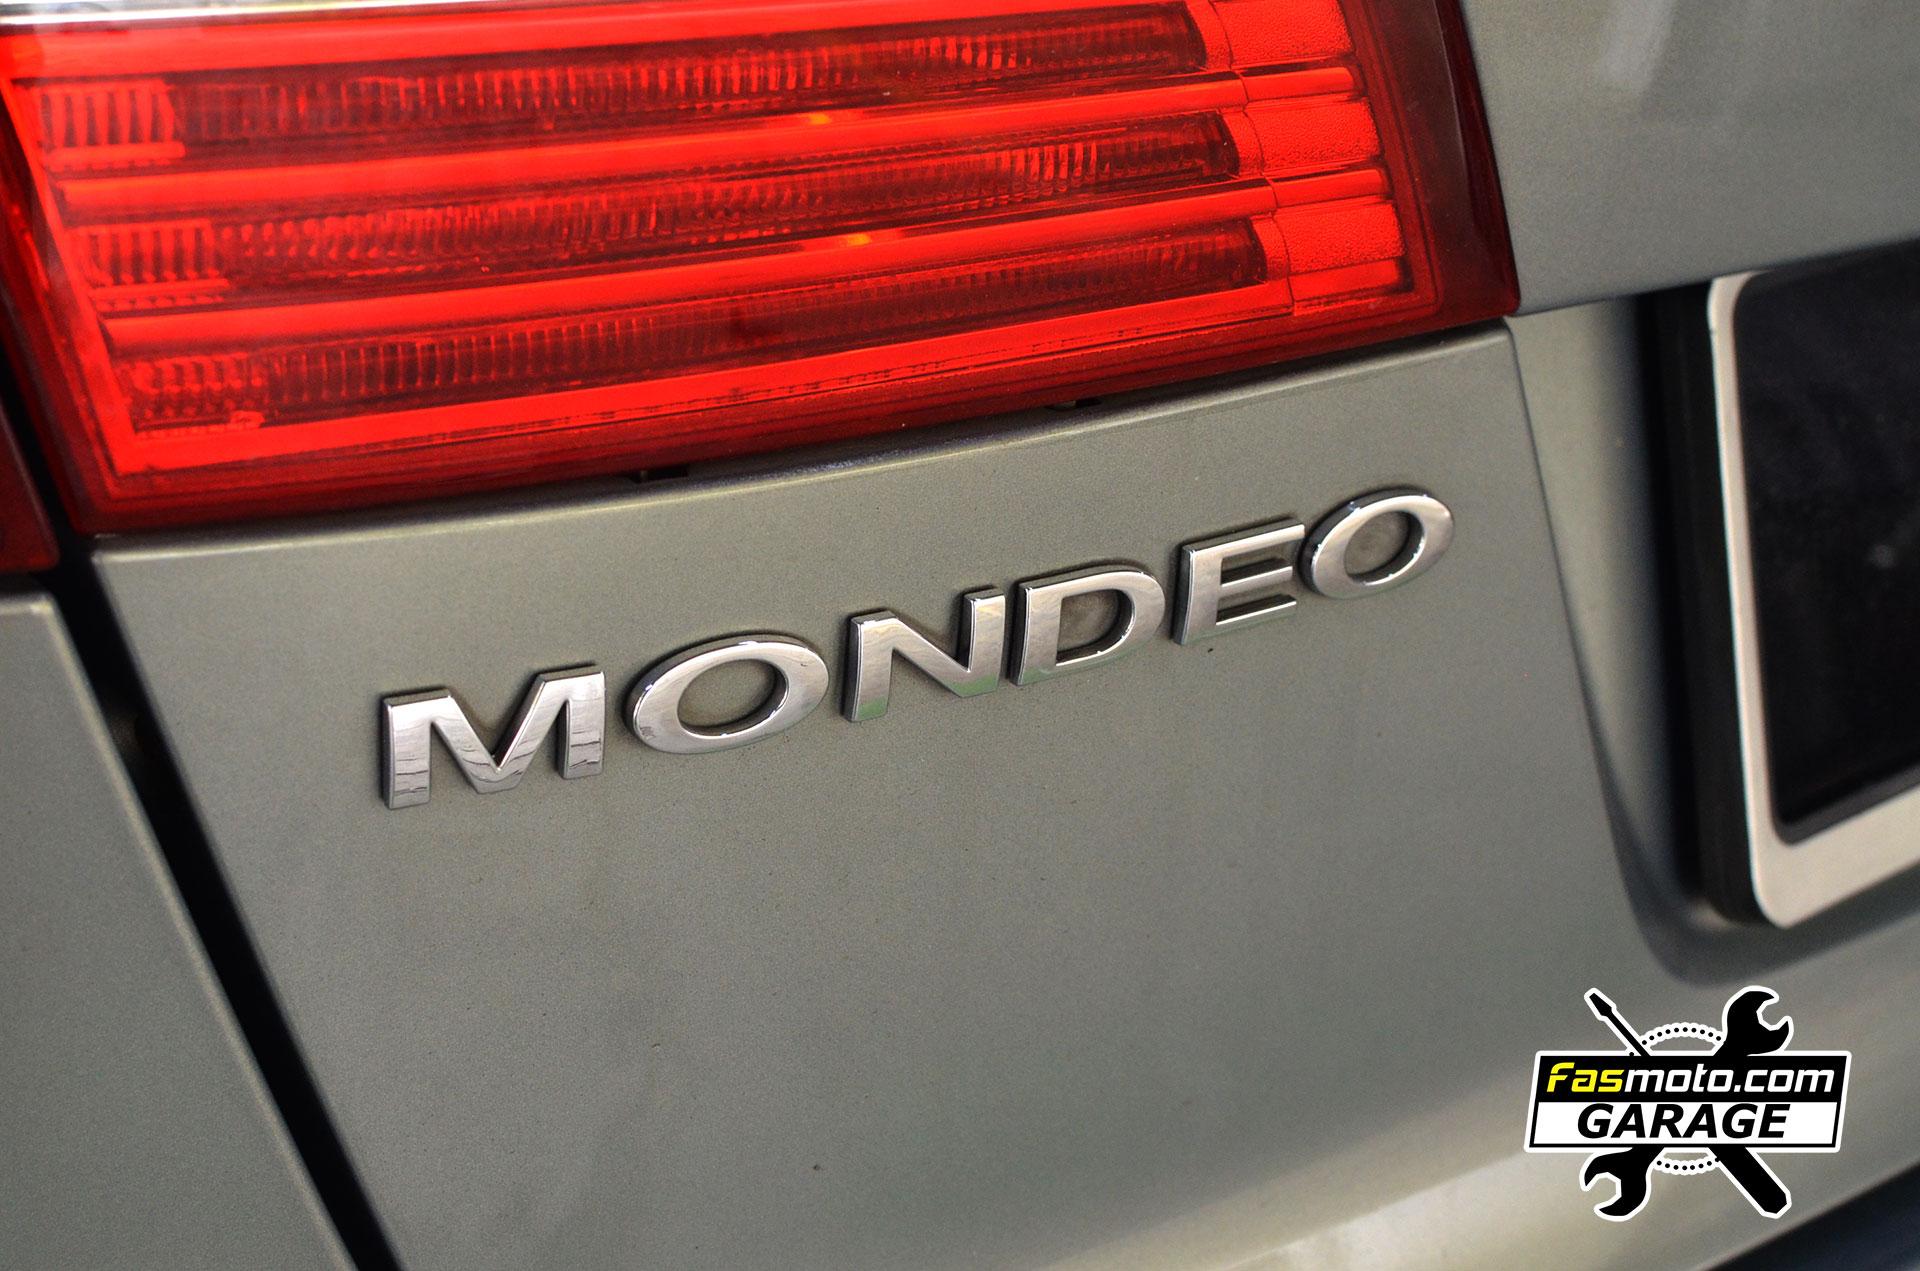 Ford Mondeo 3rd Gen Venom DSP Amplifier VPR 3.4 Infinity Basslink SM Blaupunkt BC TY 1.0 Reverse Cam